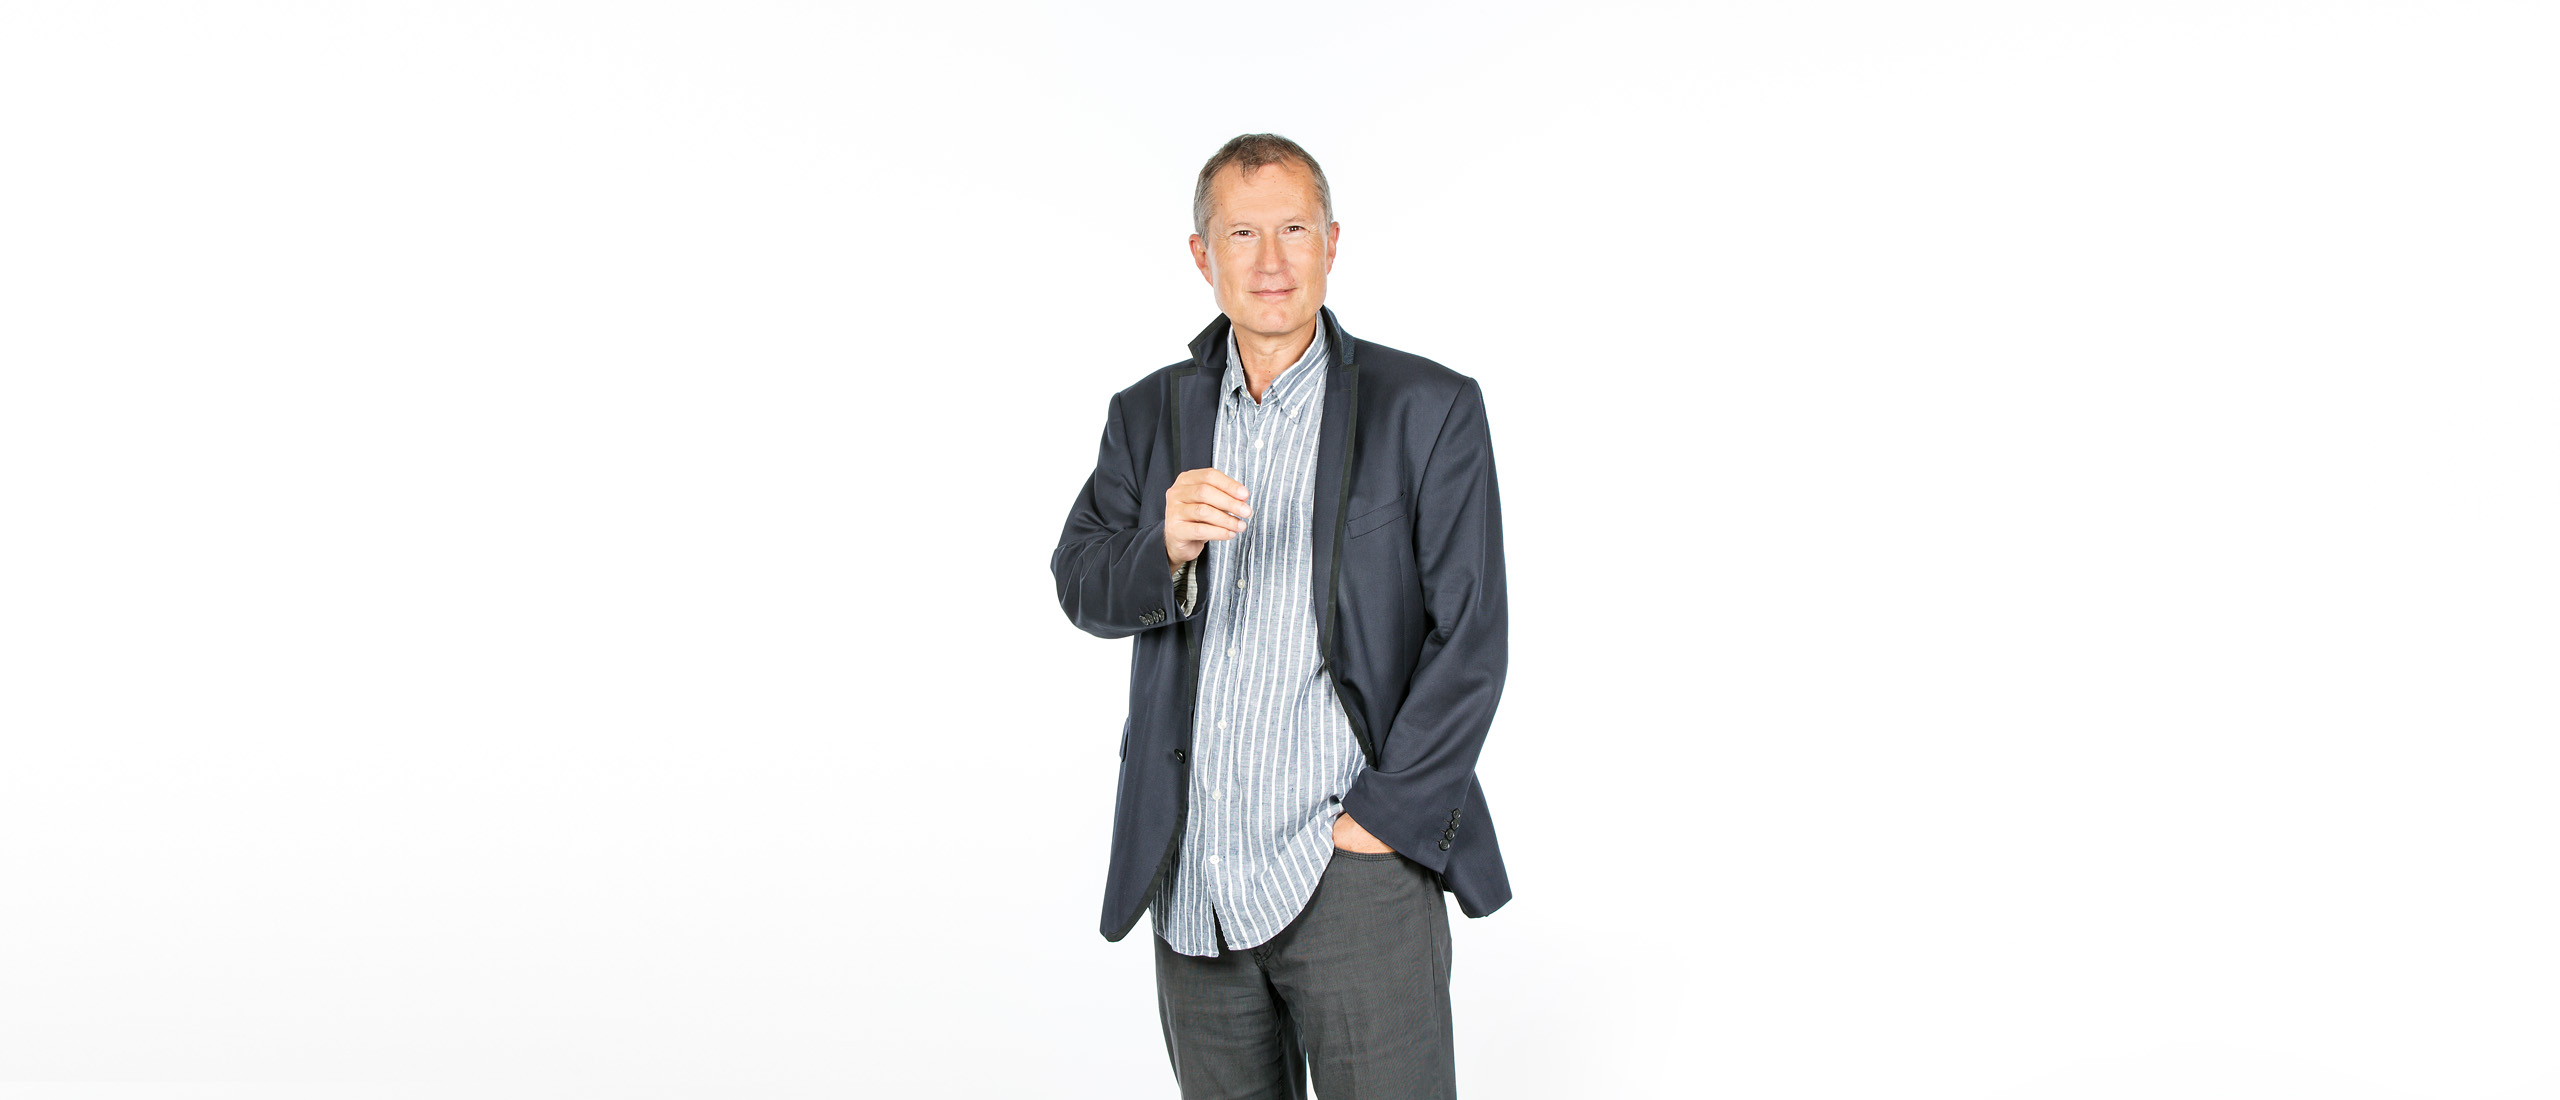 Armin Barandun, systemische Paartherapie, Basel